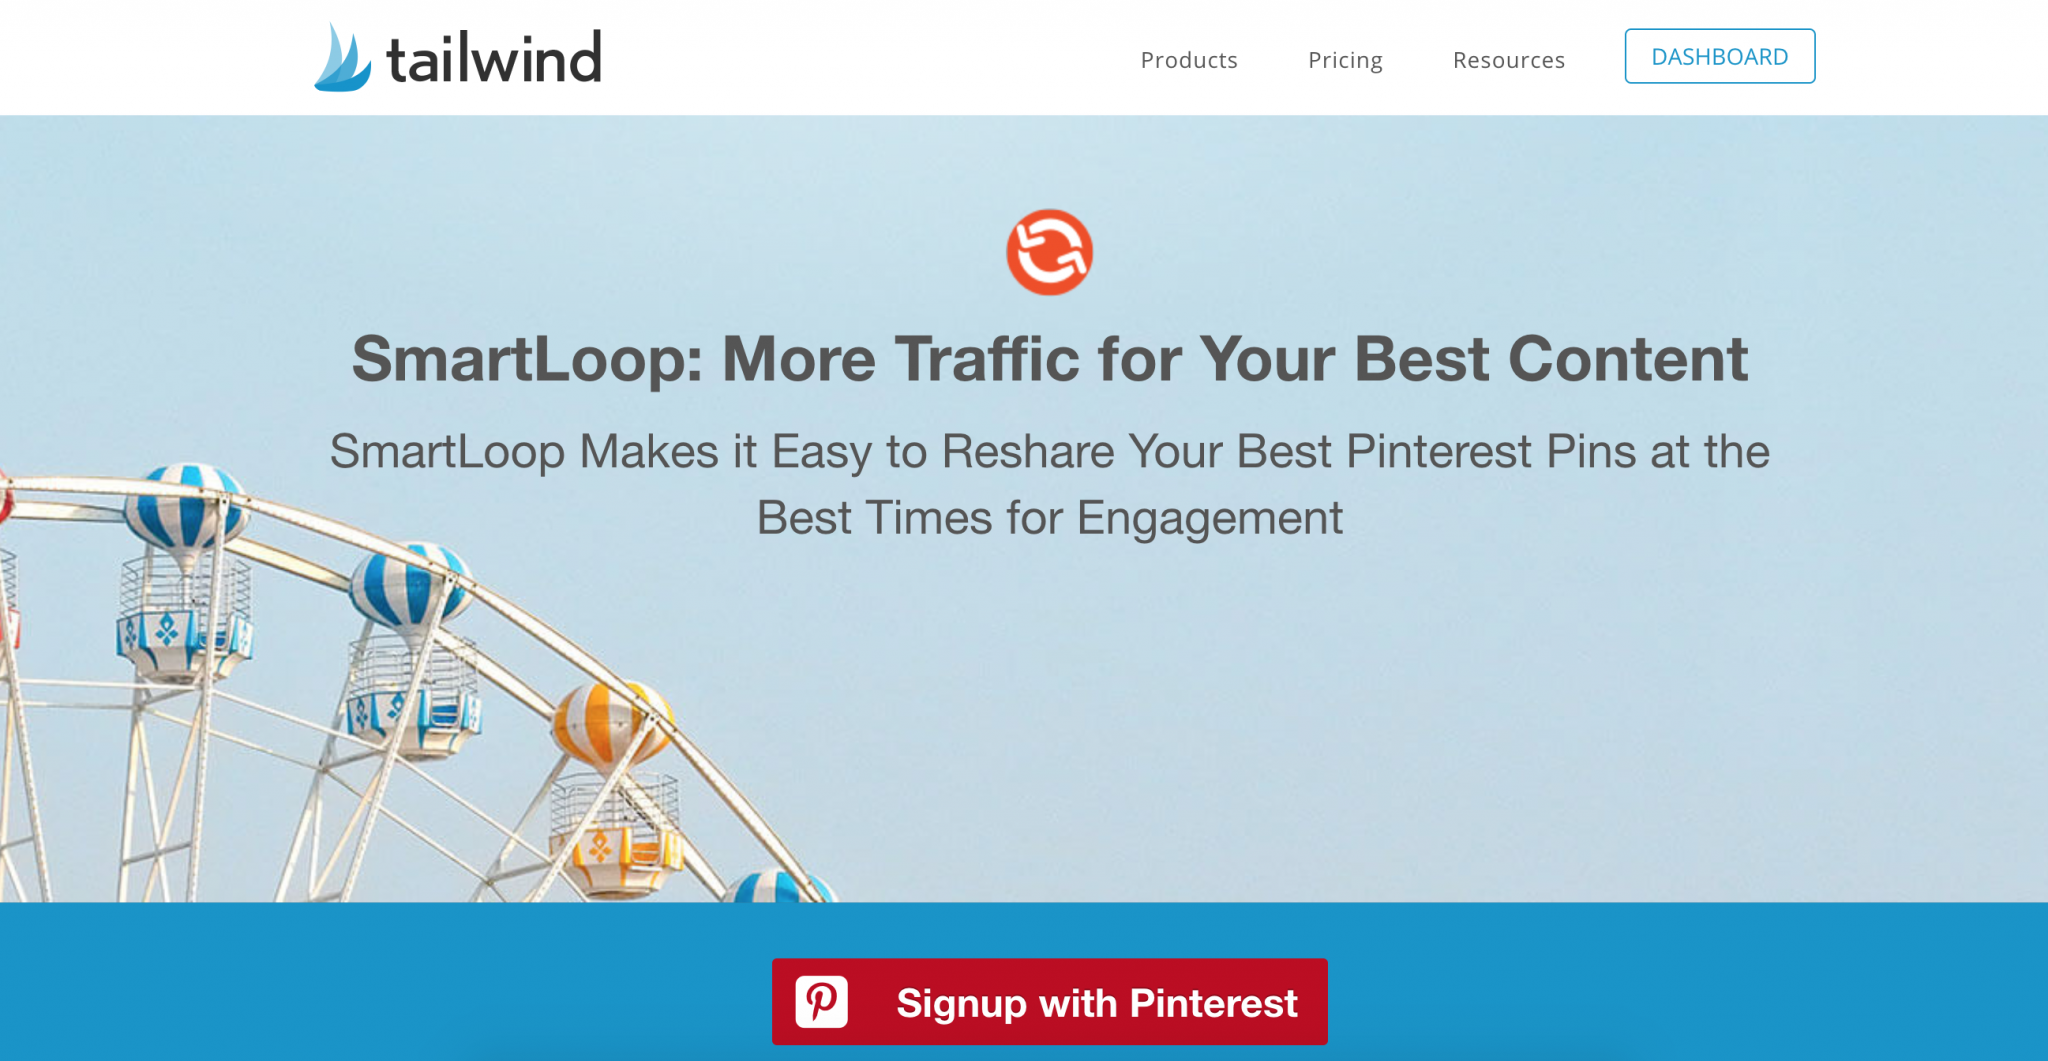 Tailwind SmartLoop